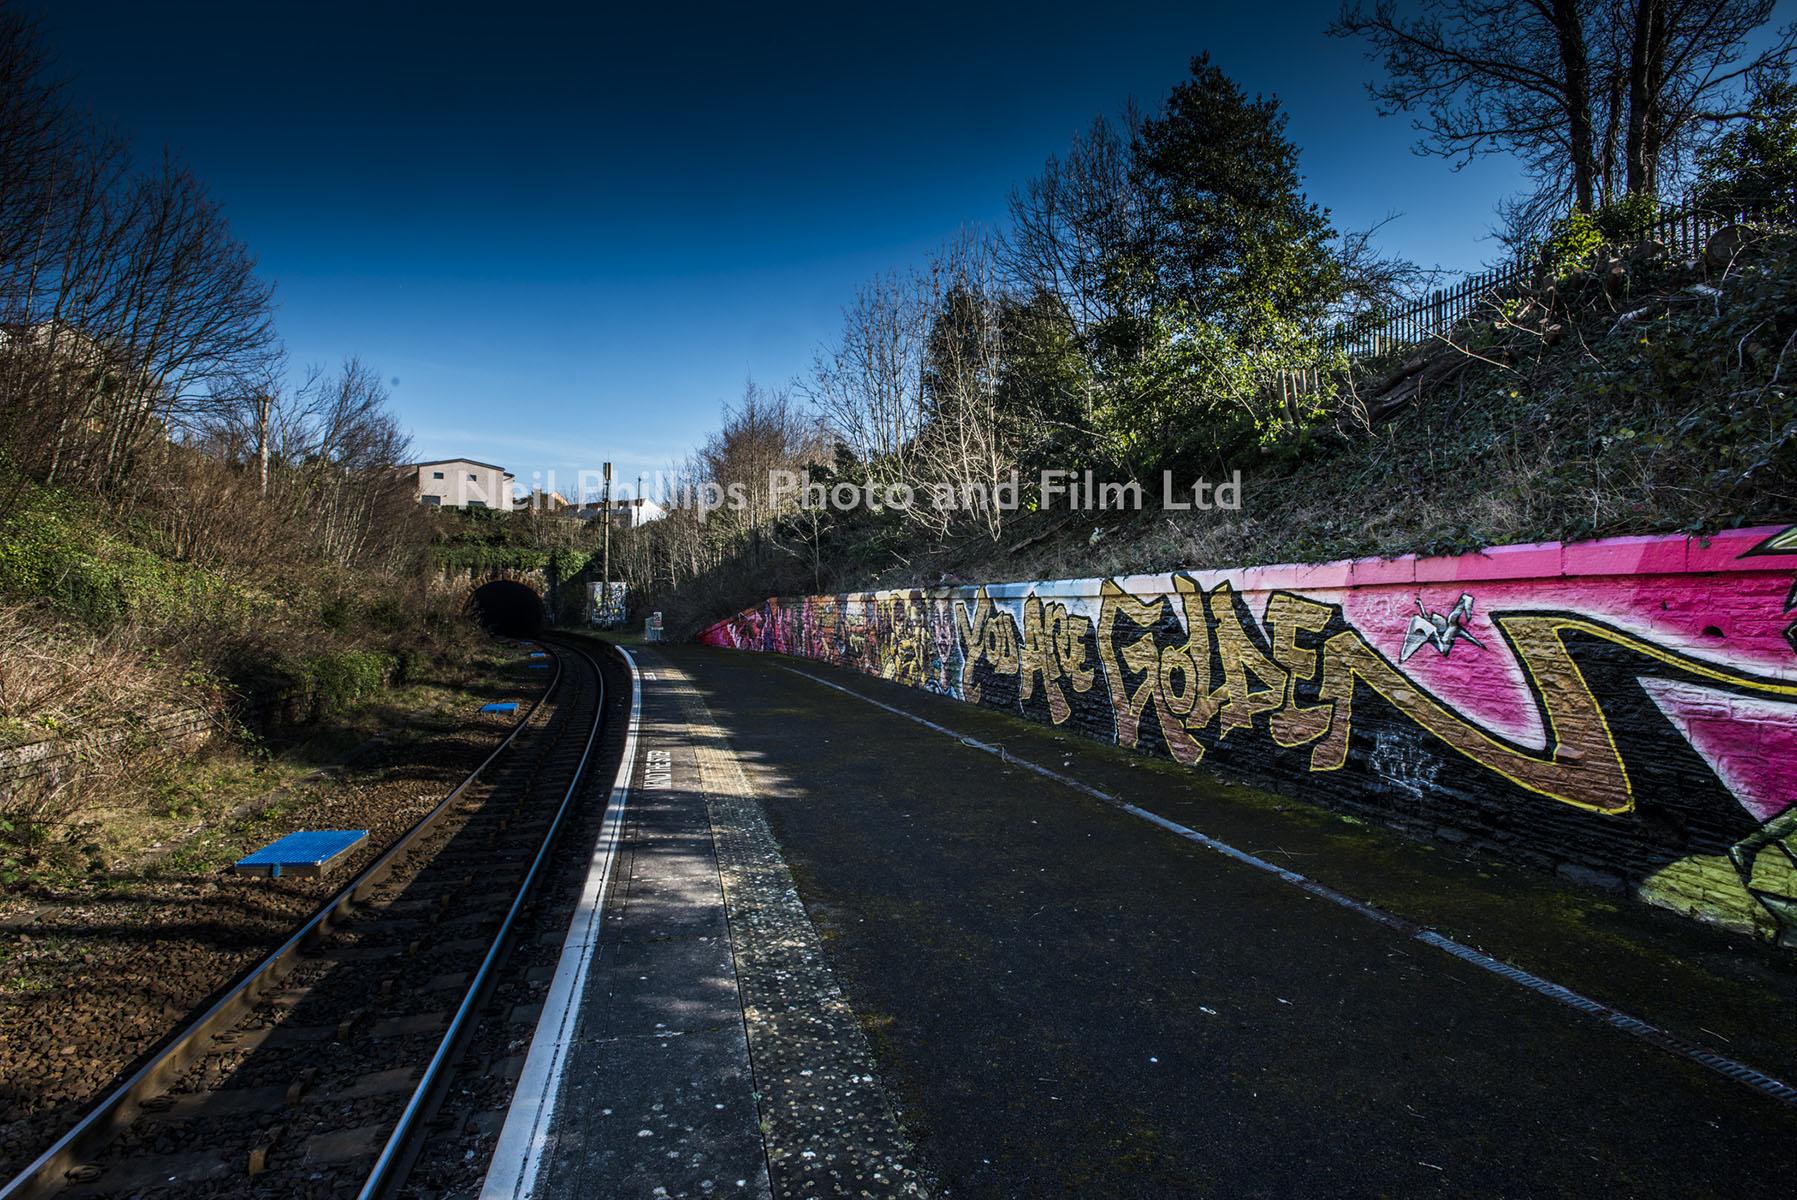 Montpelier Station, Severn Beach Line, GWR, Commercial Photographer in Bristol, Bristol Graffiti